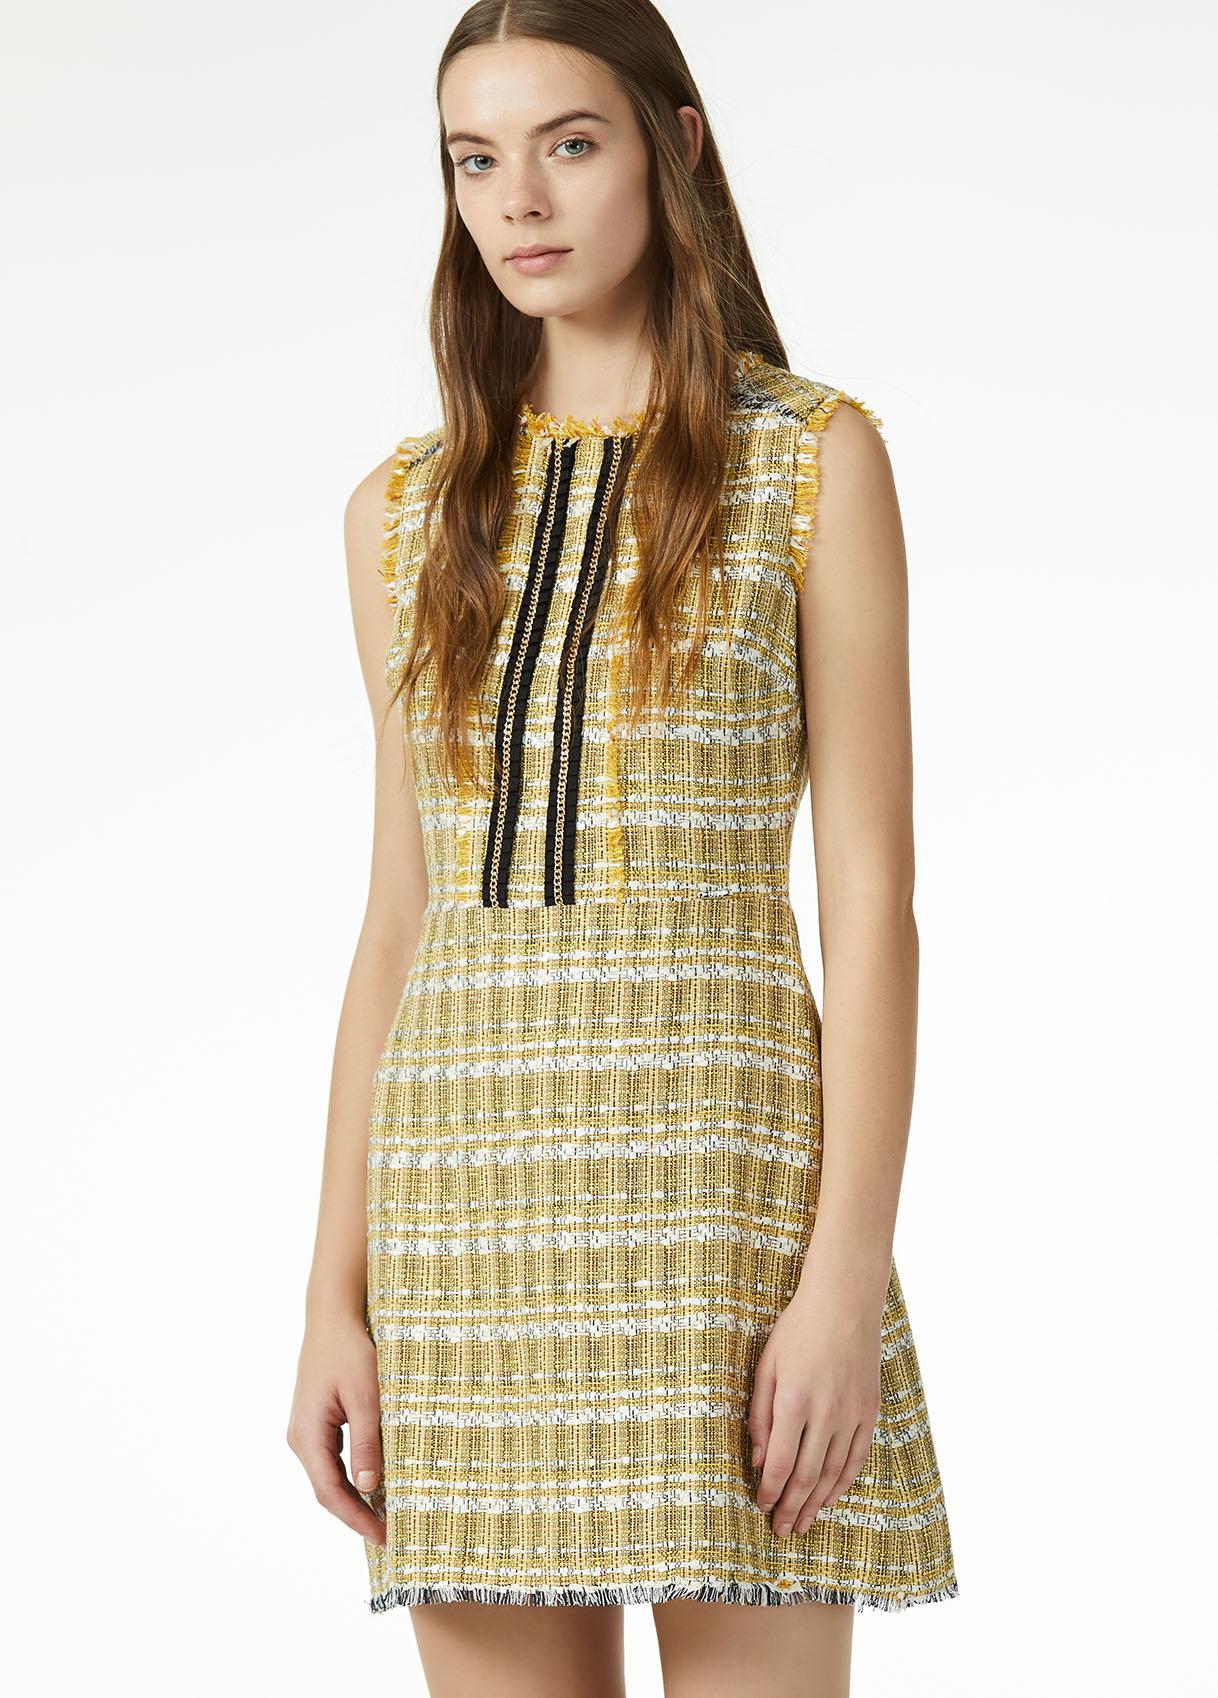 liu jo8059599735543-Dresses-Shortdresses-W19235T0183V9909-I-AF-N-N-01-N